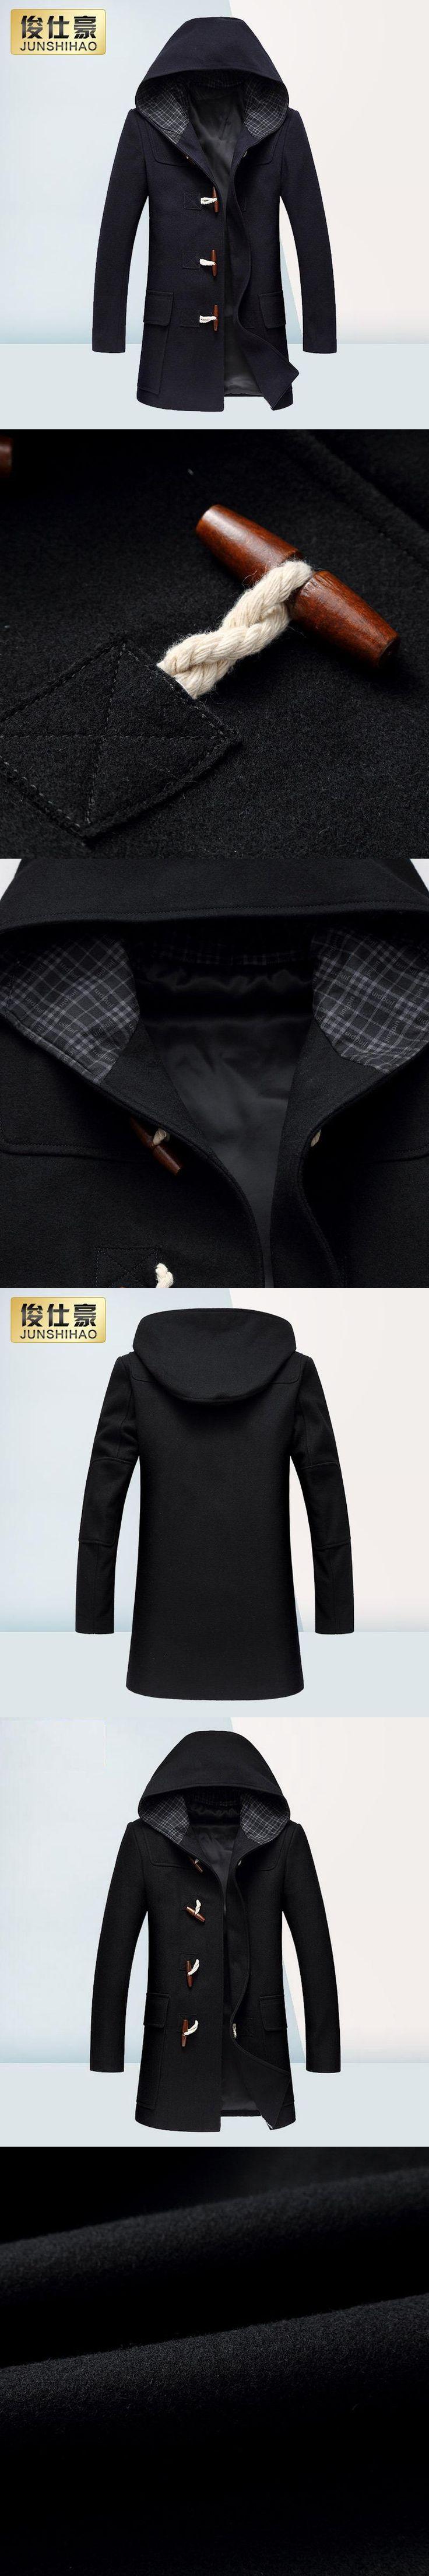 Winter Wool Coat Men Fashion Horn Button Designer Wool Jacket Men High Quality Hooded Mens Peacoat Size M-3XL